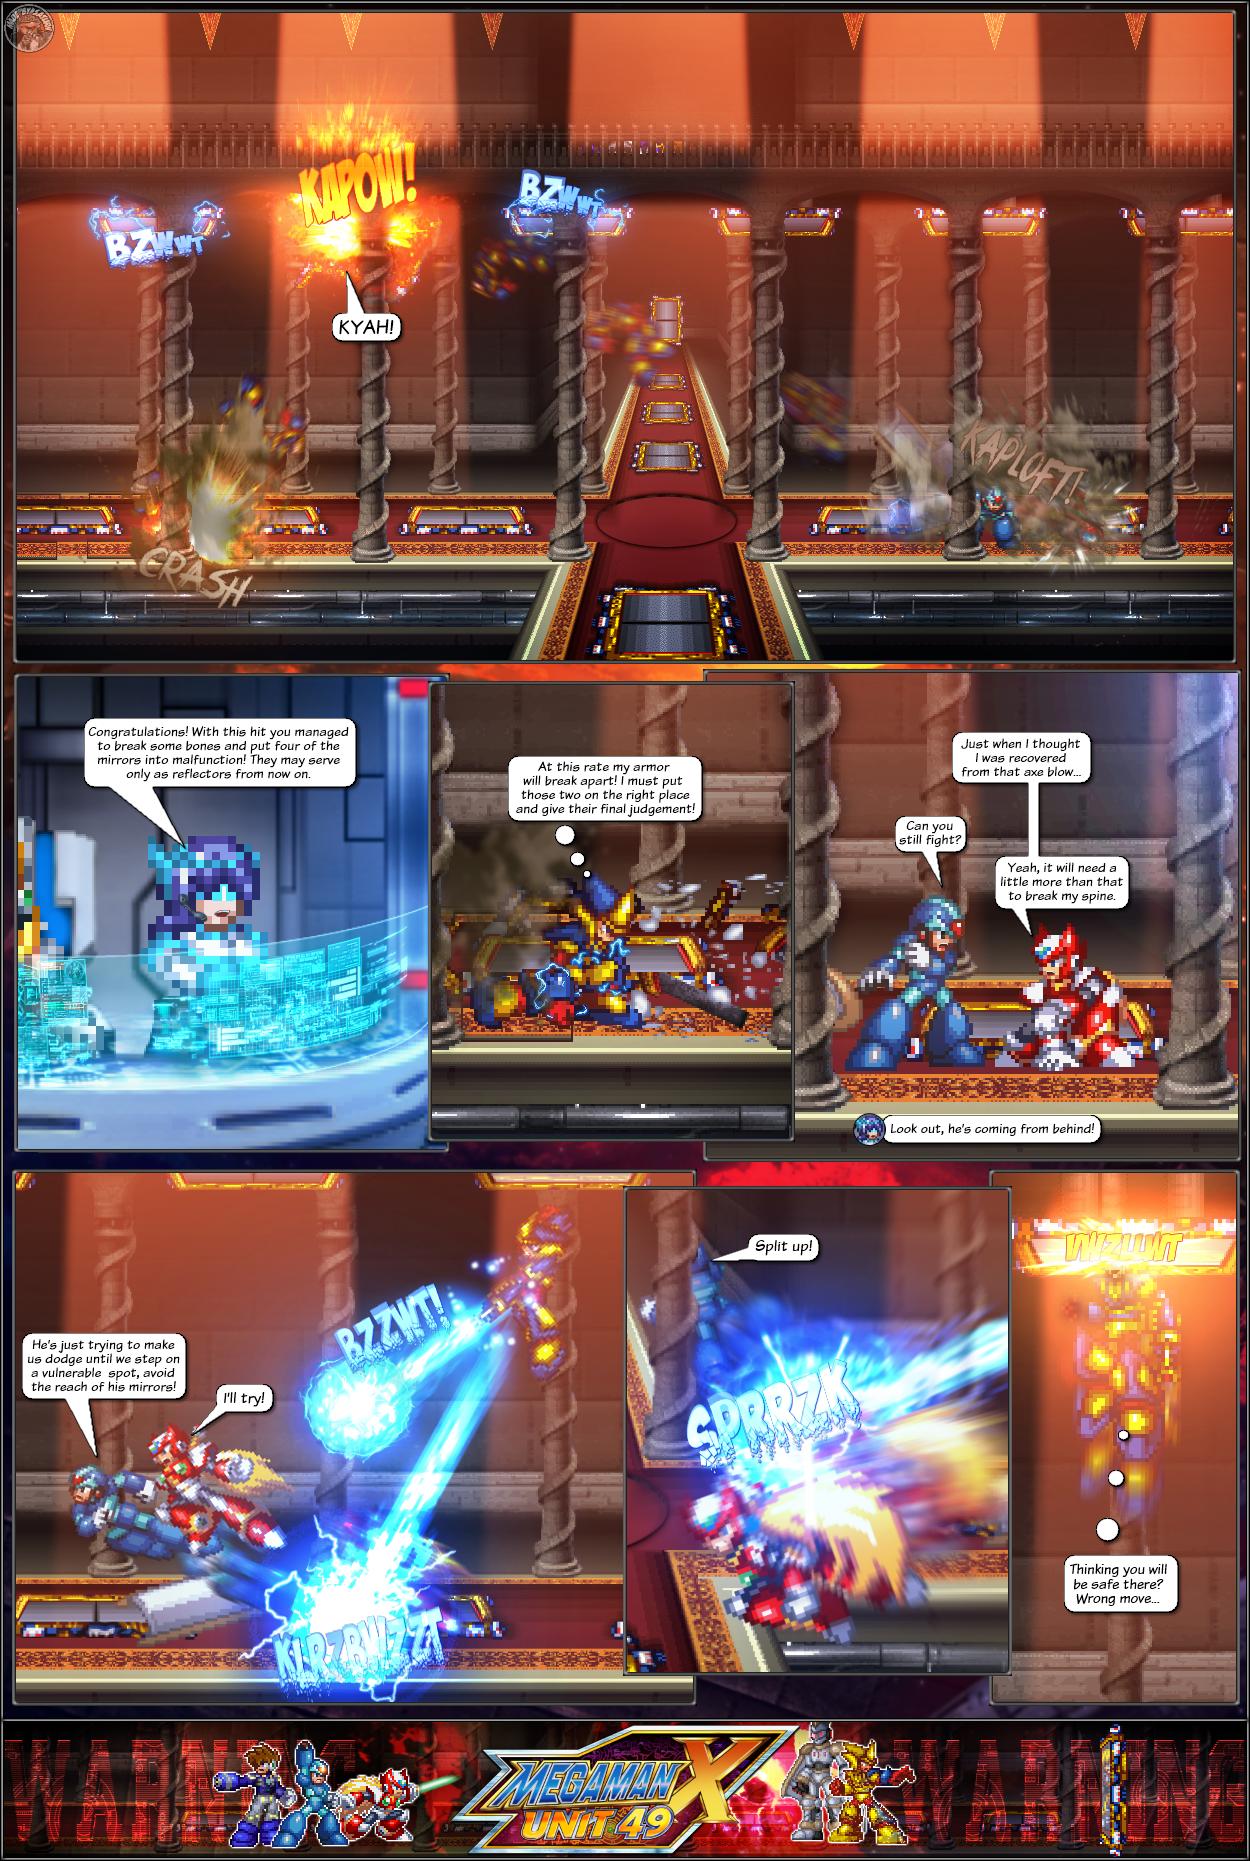 MMX:U49 - S1Ch16: Orchestra of Lights (Page 11) by IrregularSaturn